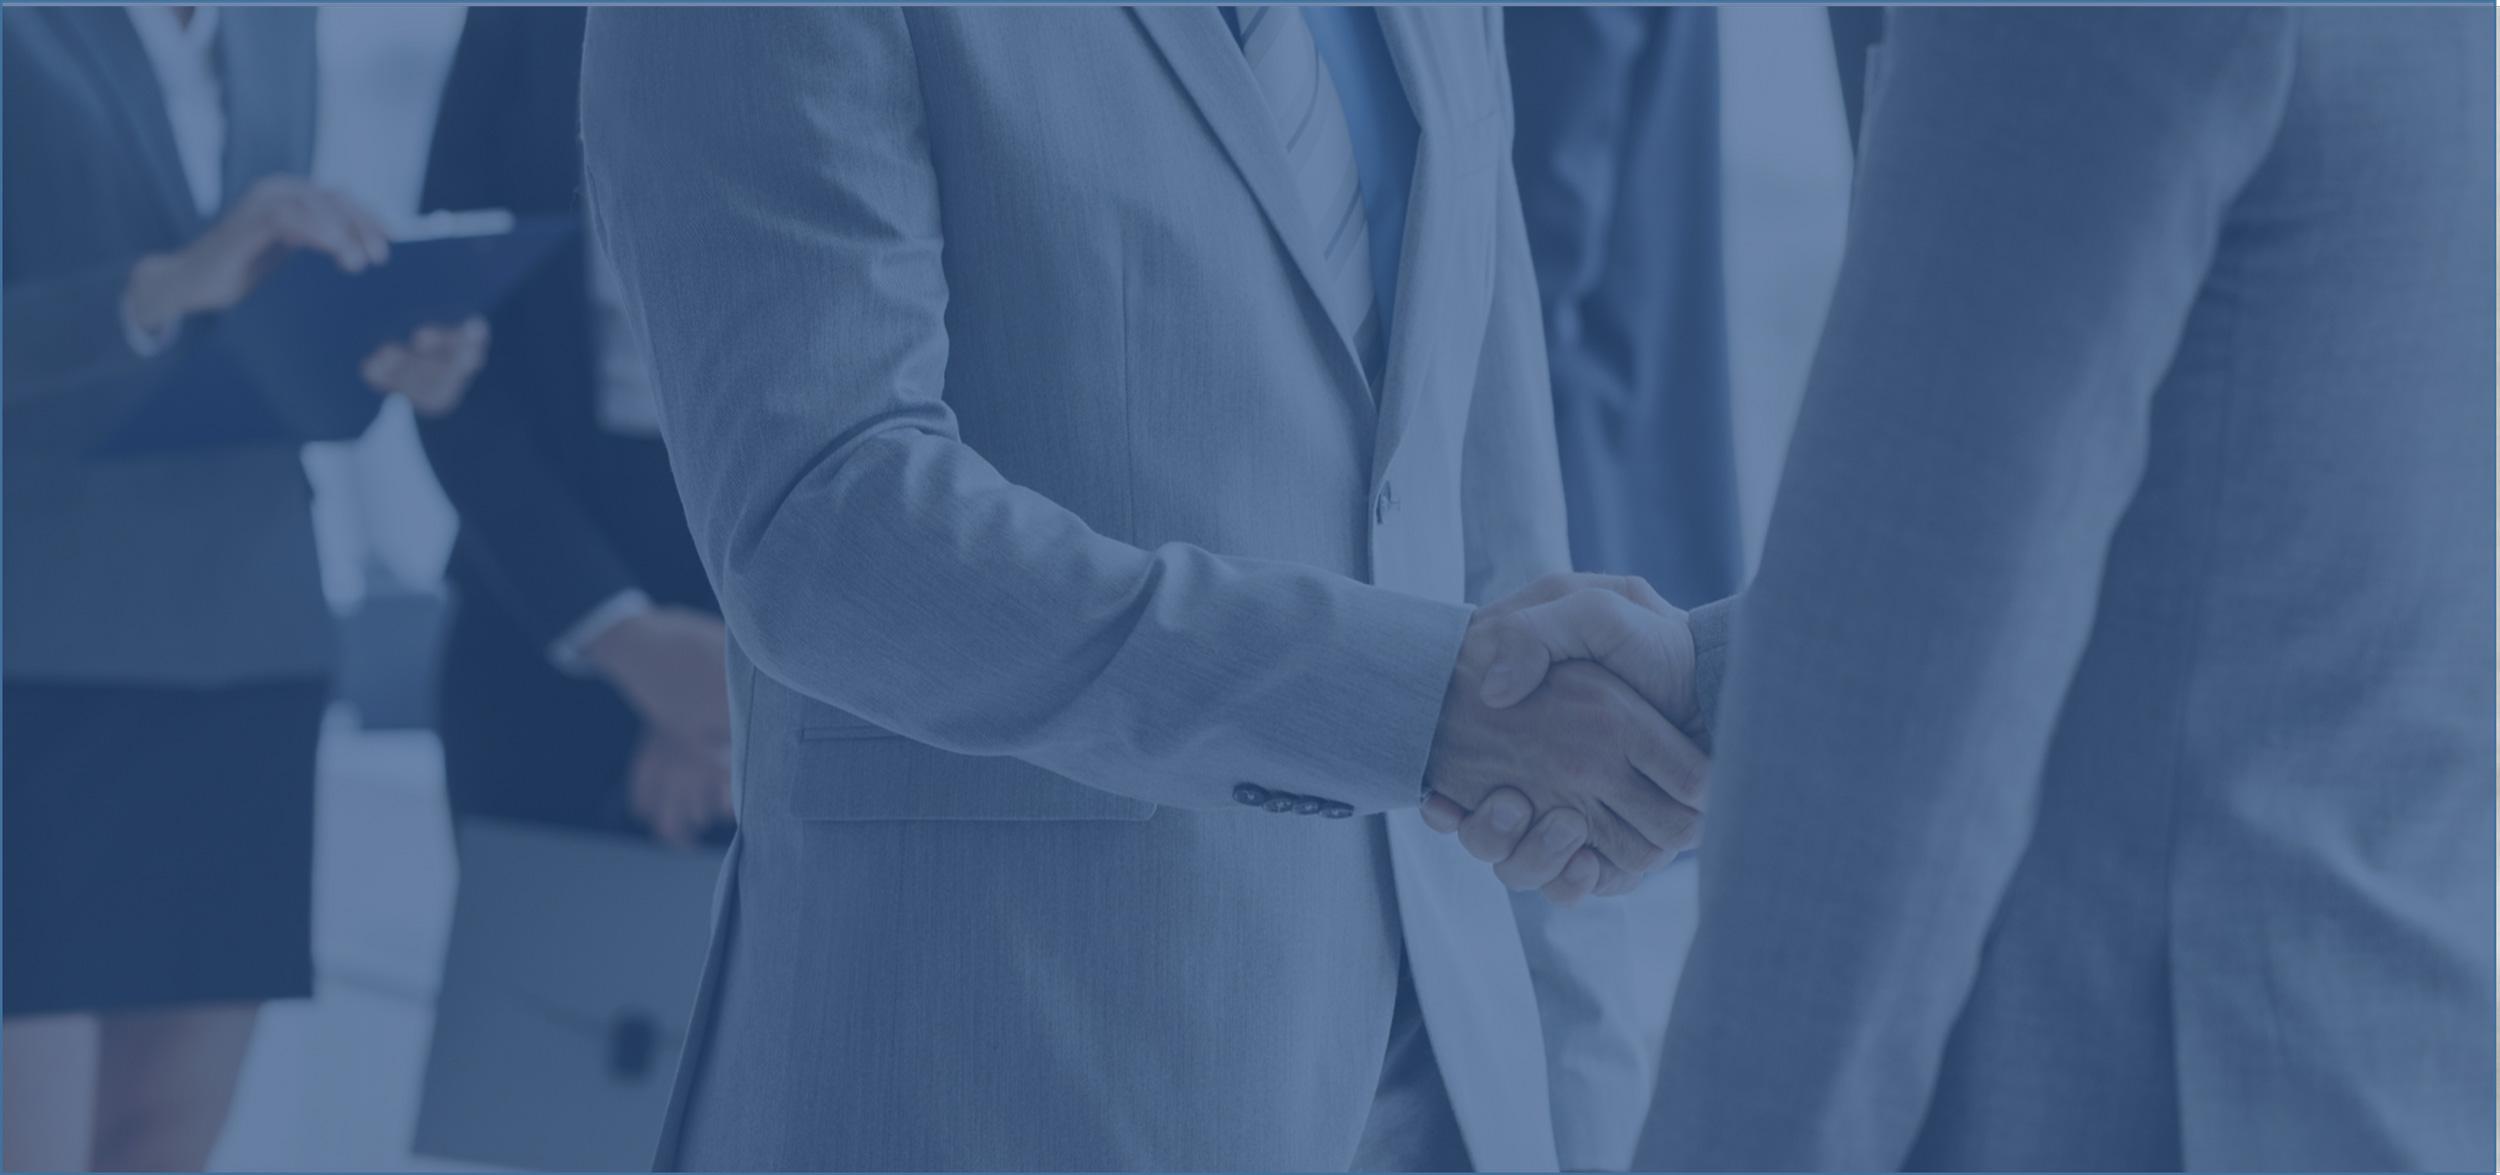 Long Term Agreements